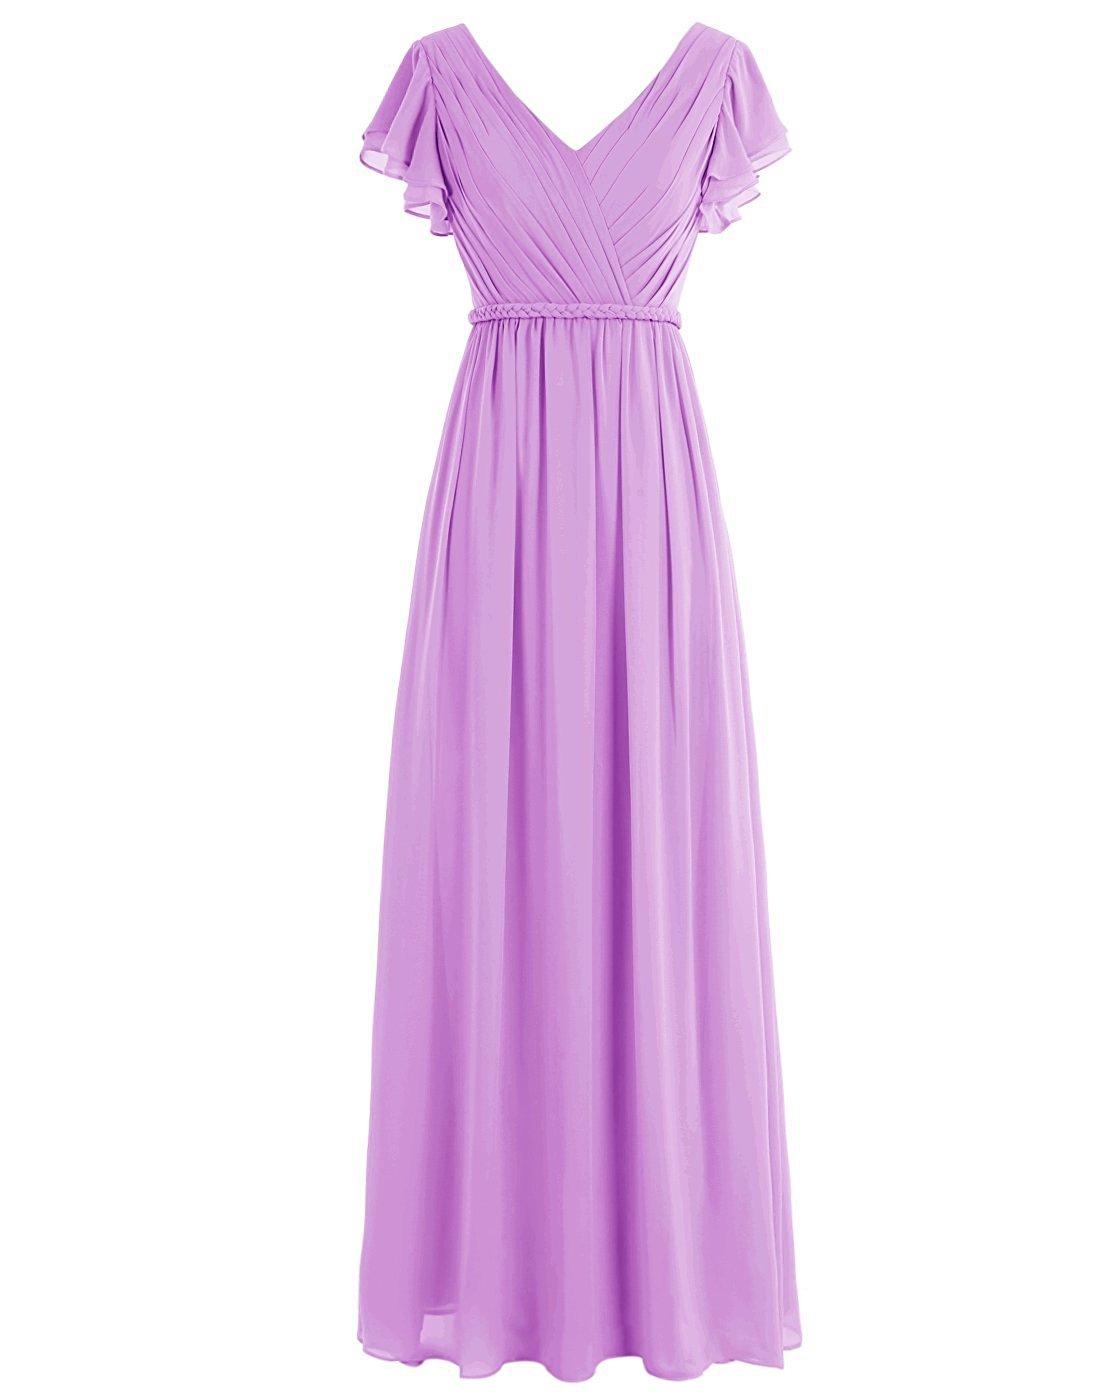 WenSai Women Pleated Long Bridesmaid Dresses Chiffon V Neck Cap Sleeves Lilac us17w